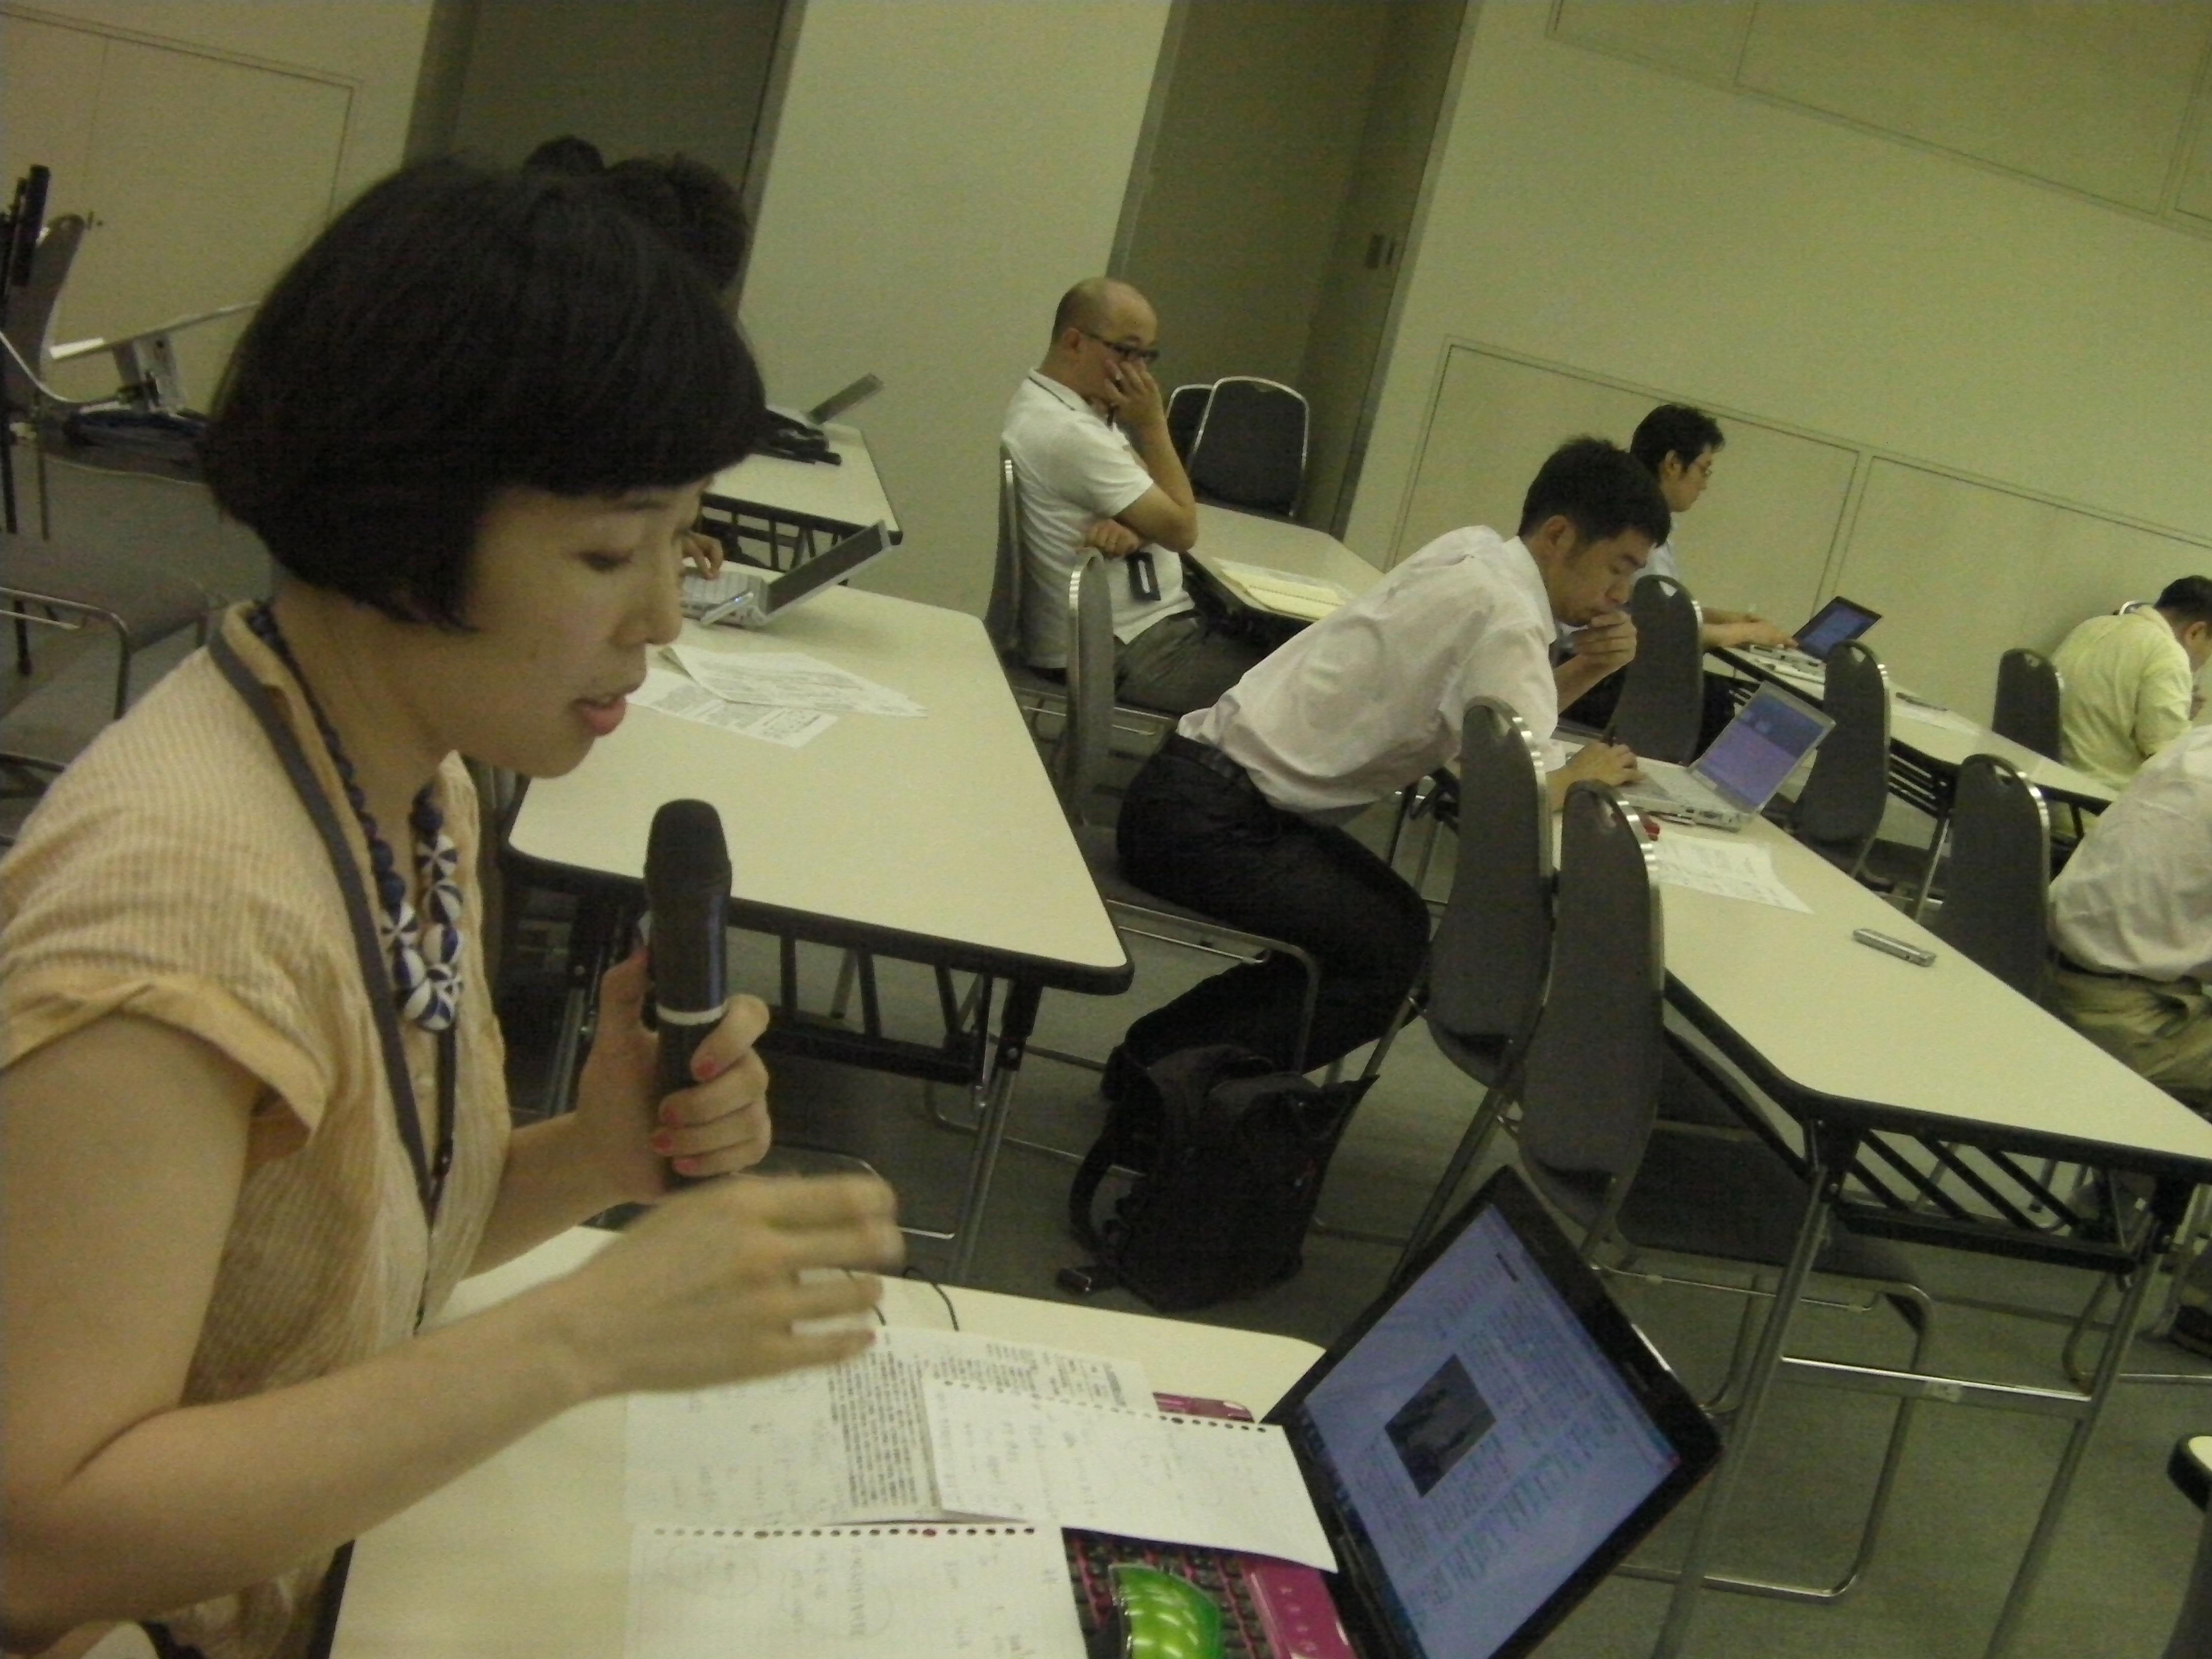 http://daily.magazine9.jp/m9/oshidori/SANY0440.JPG